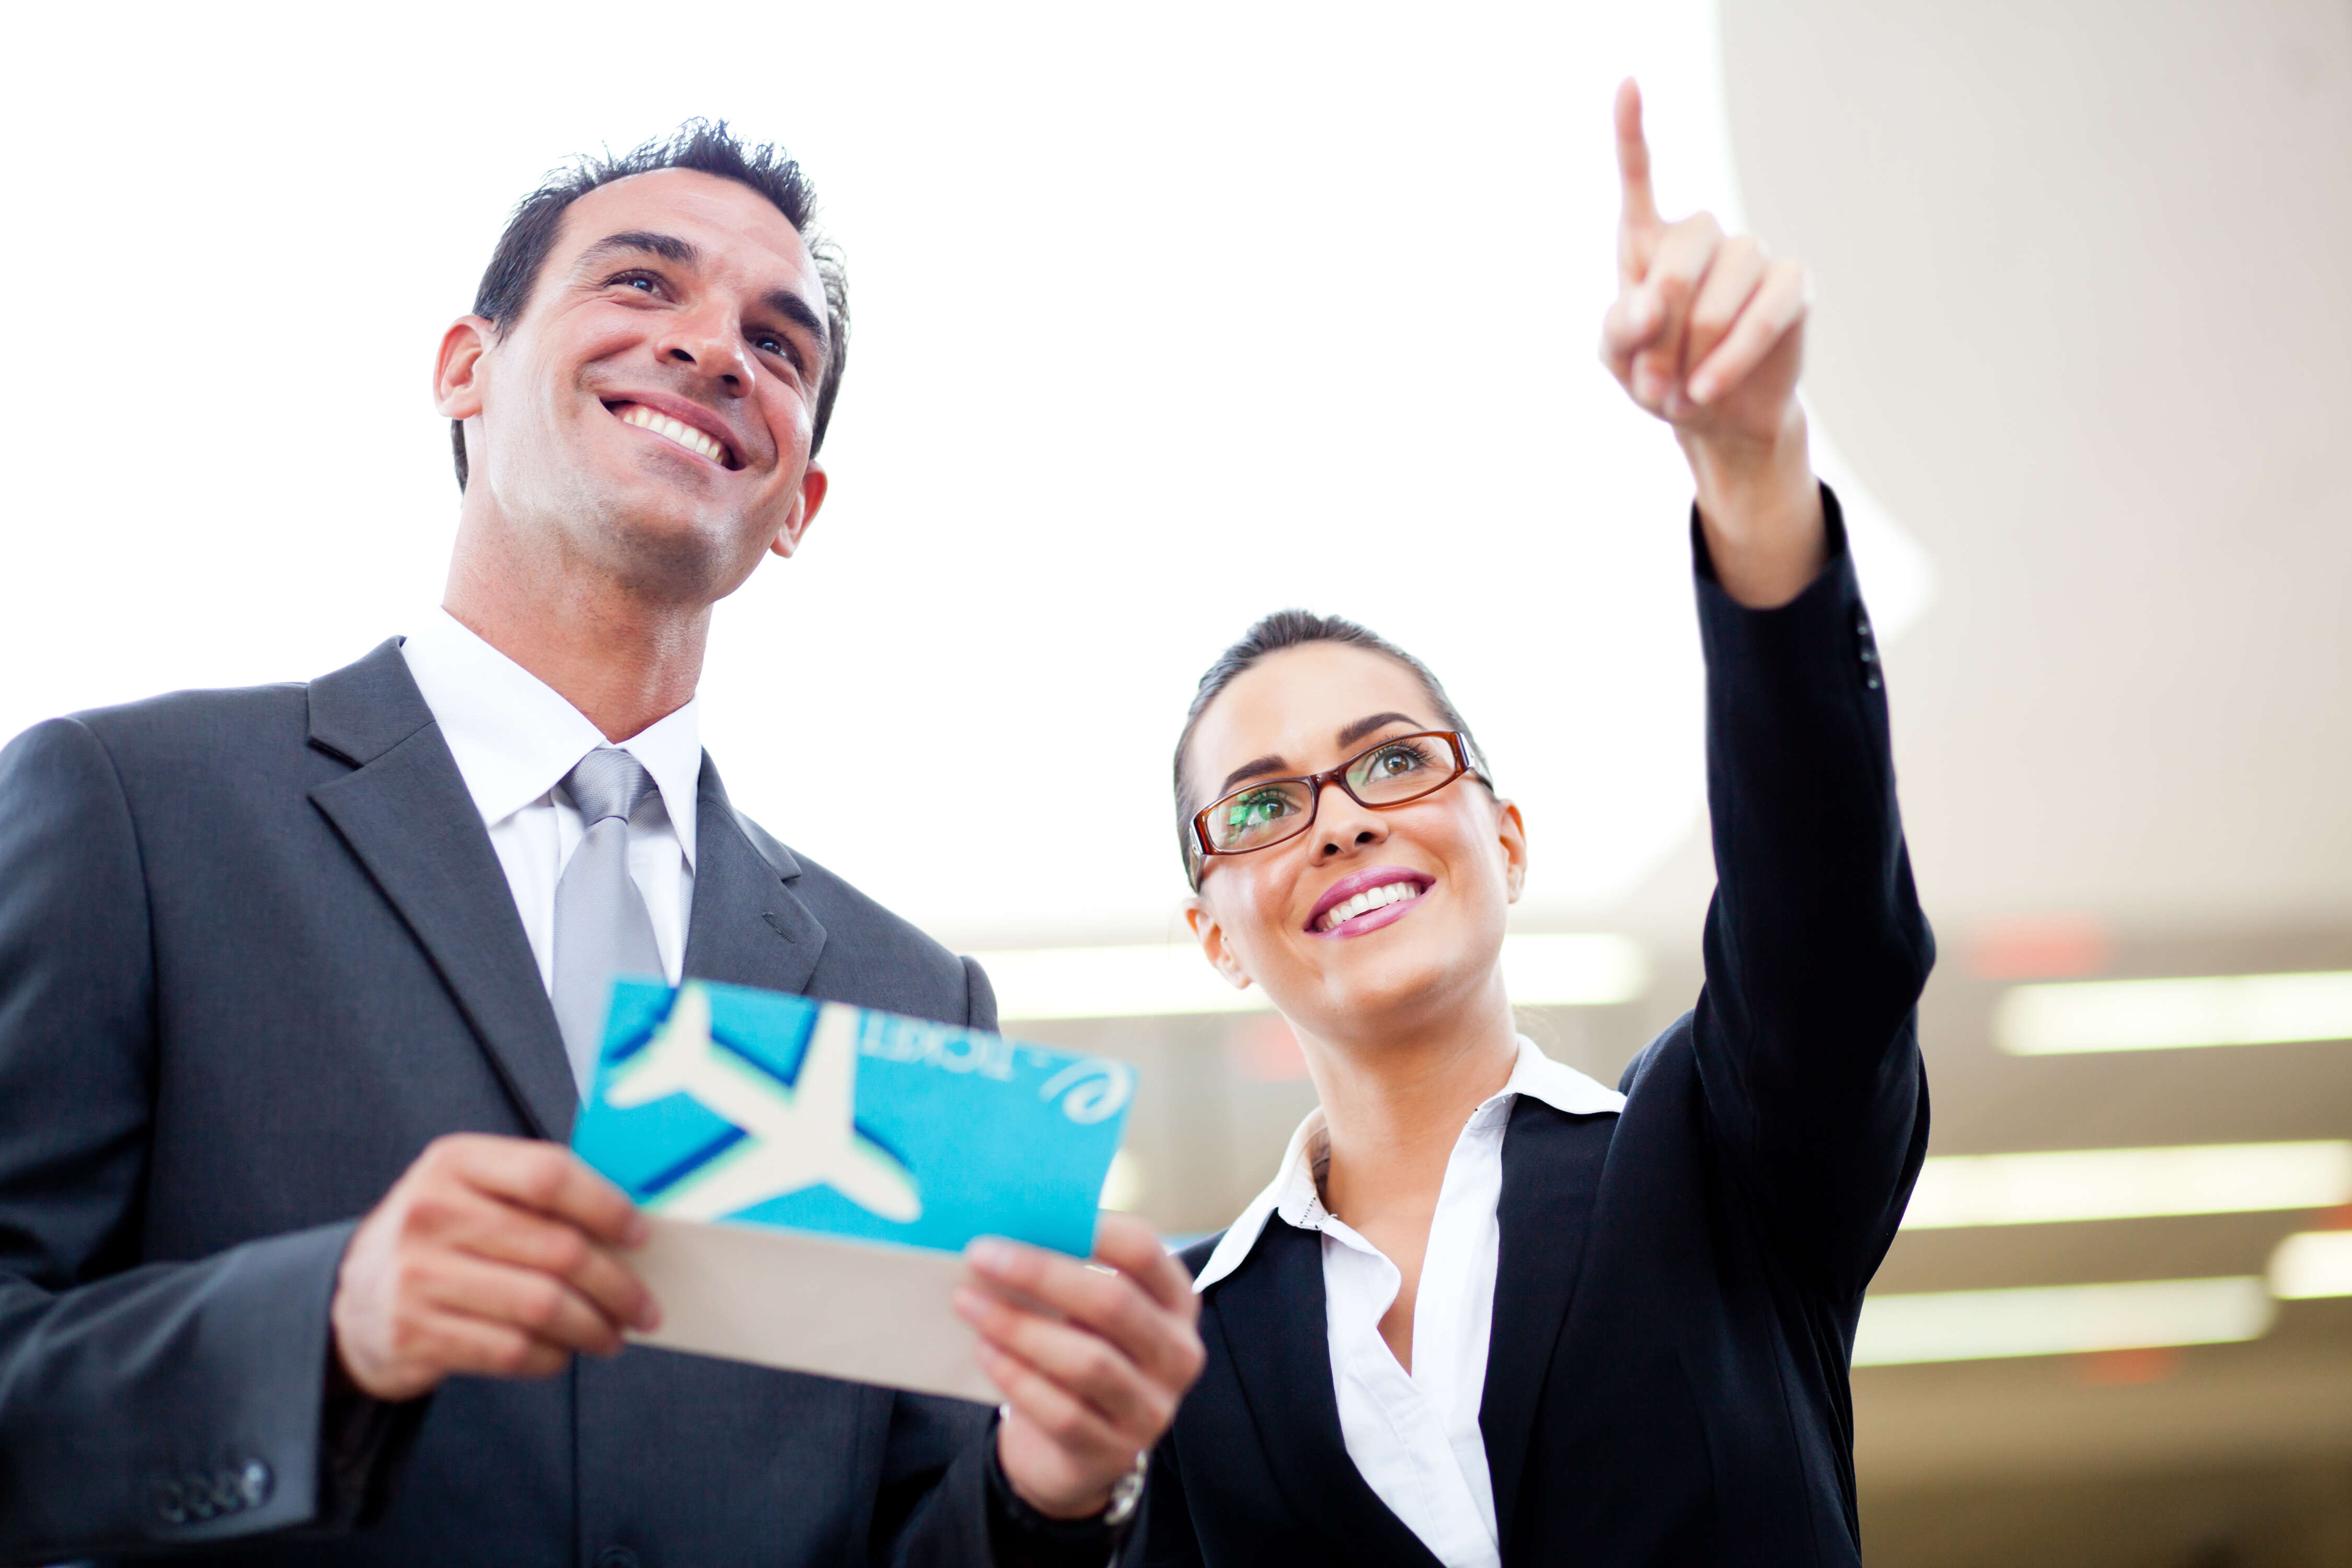 How to enjoy a business trip